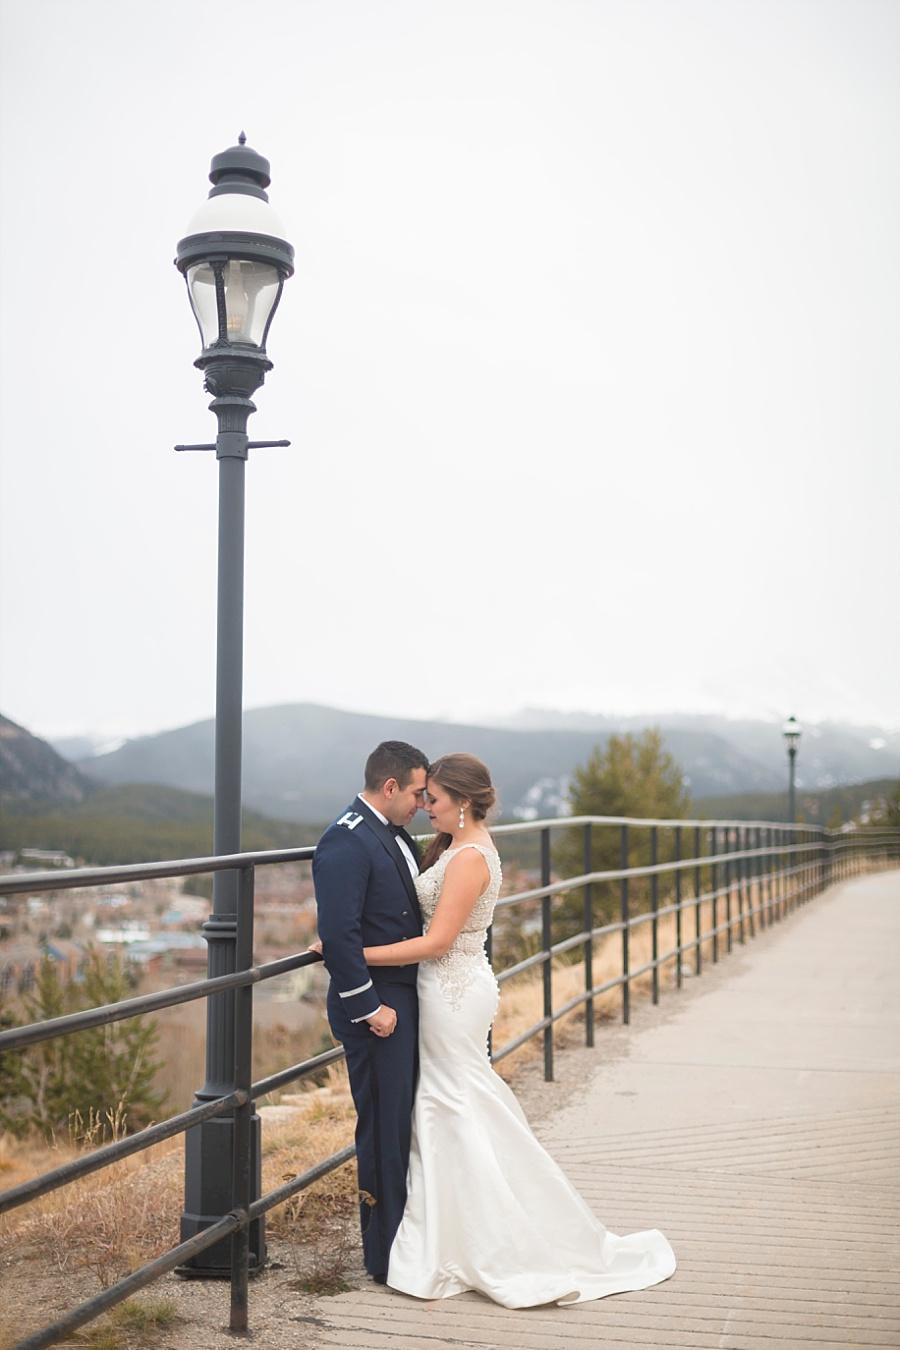 Stacy Anderson Photography Breckenridge Denver Boulder Vail Colorado Travel Lifestyle Elopement Vow renewal Family Wedding Photographer_0029.jpg